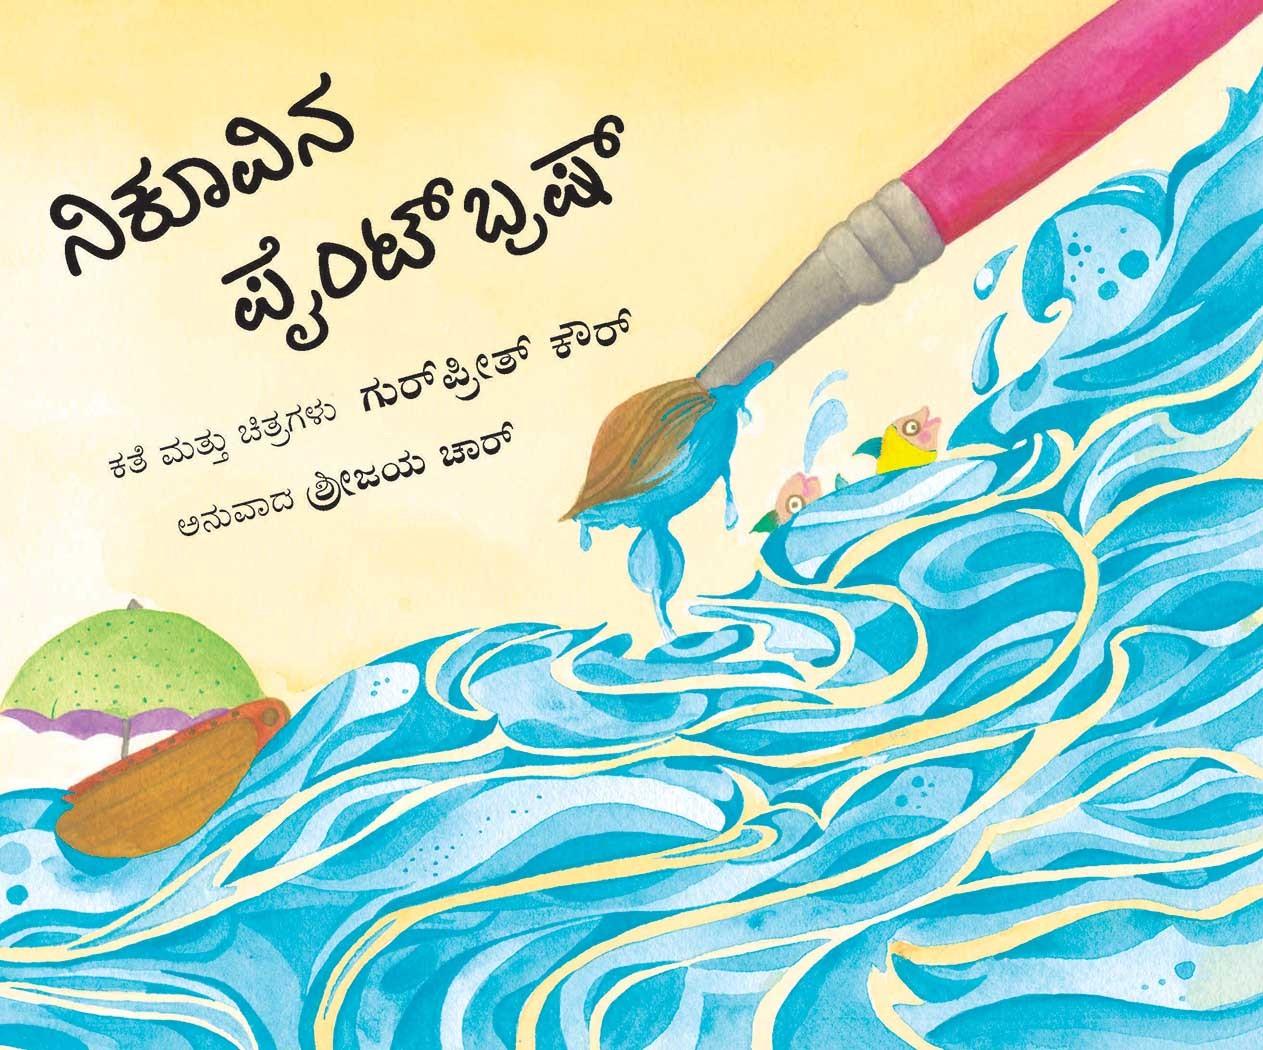 Nikoo's Paintbrush/Nikoovina Paintbrush (Kannada)